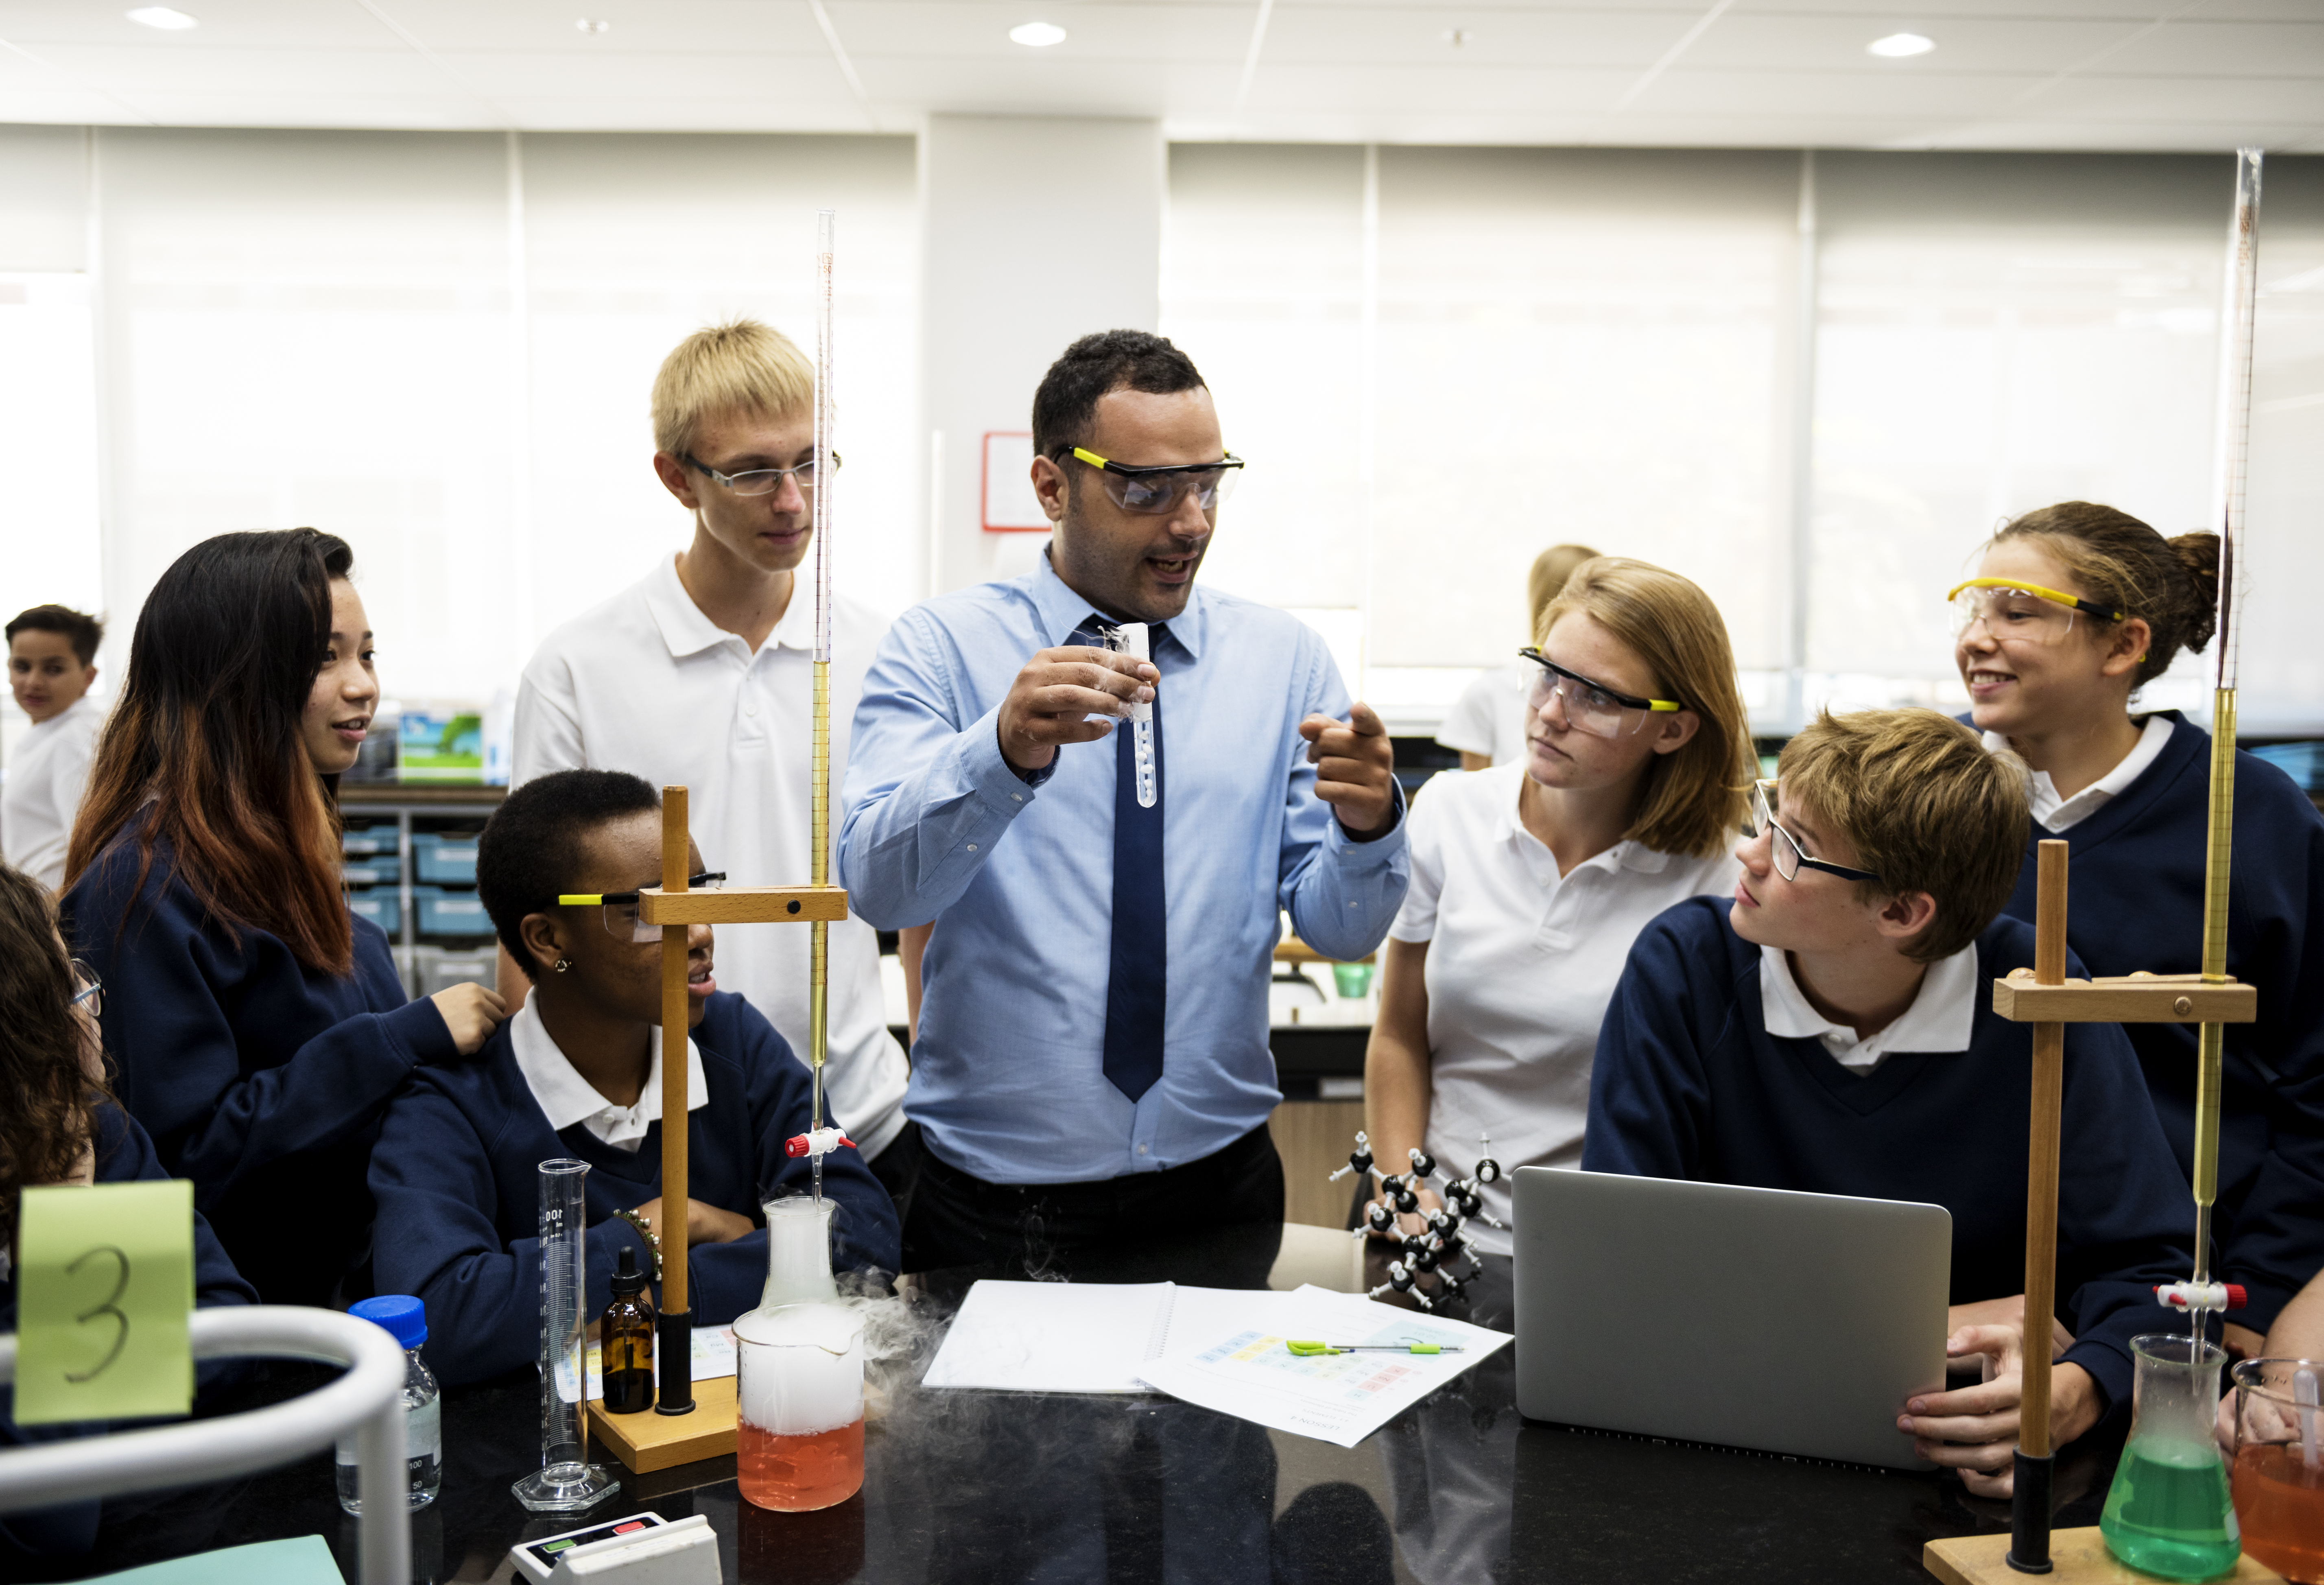 Science Teacher Talking